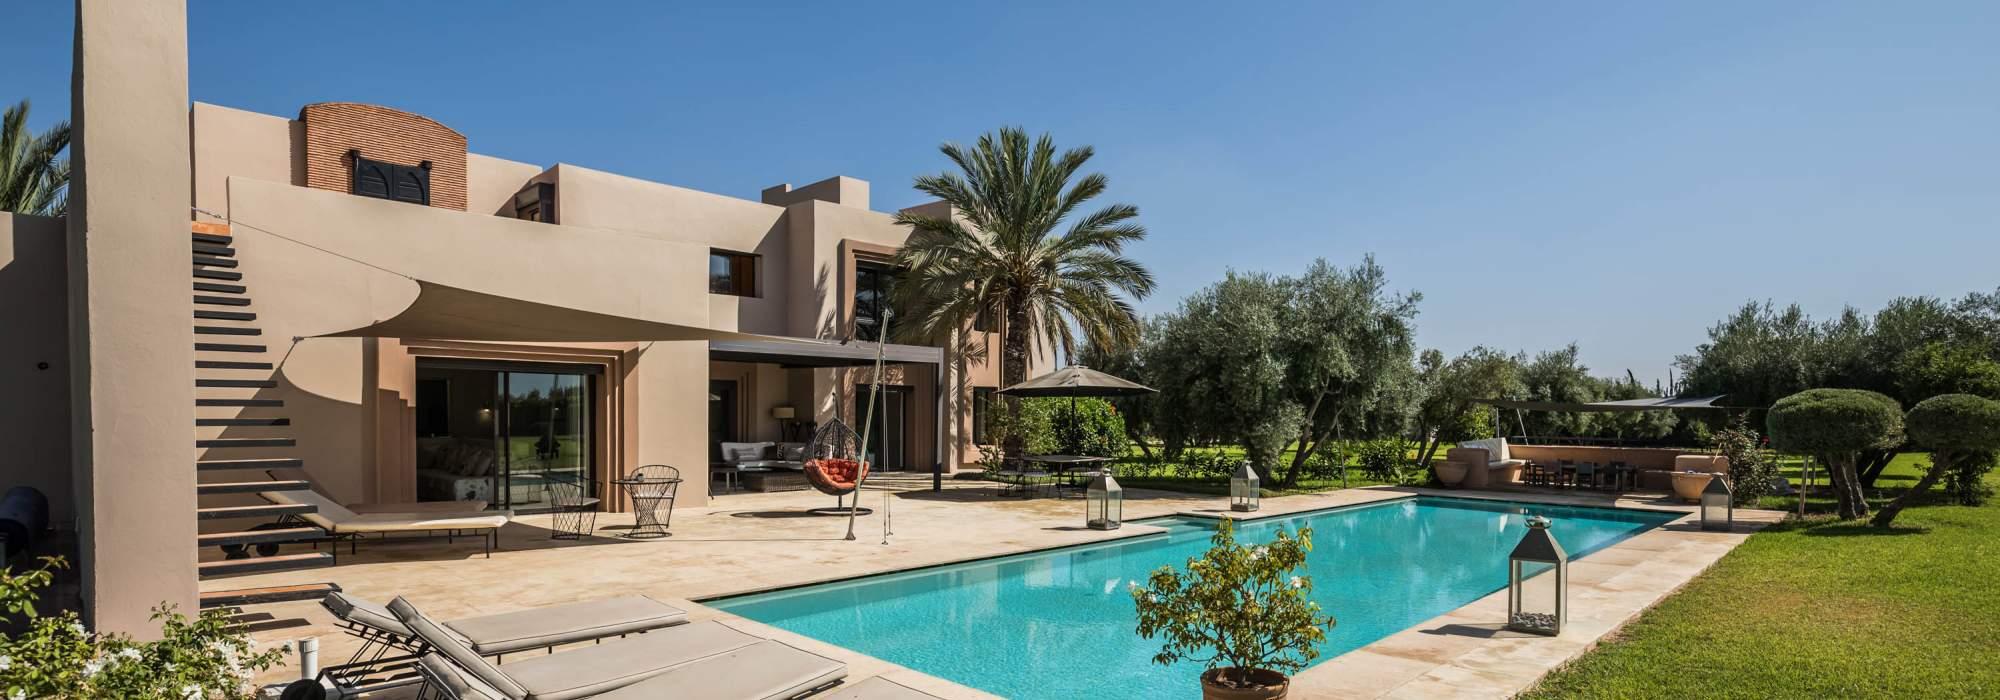 villa contemporaine a vendre proche de centre ville route d'ourika